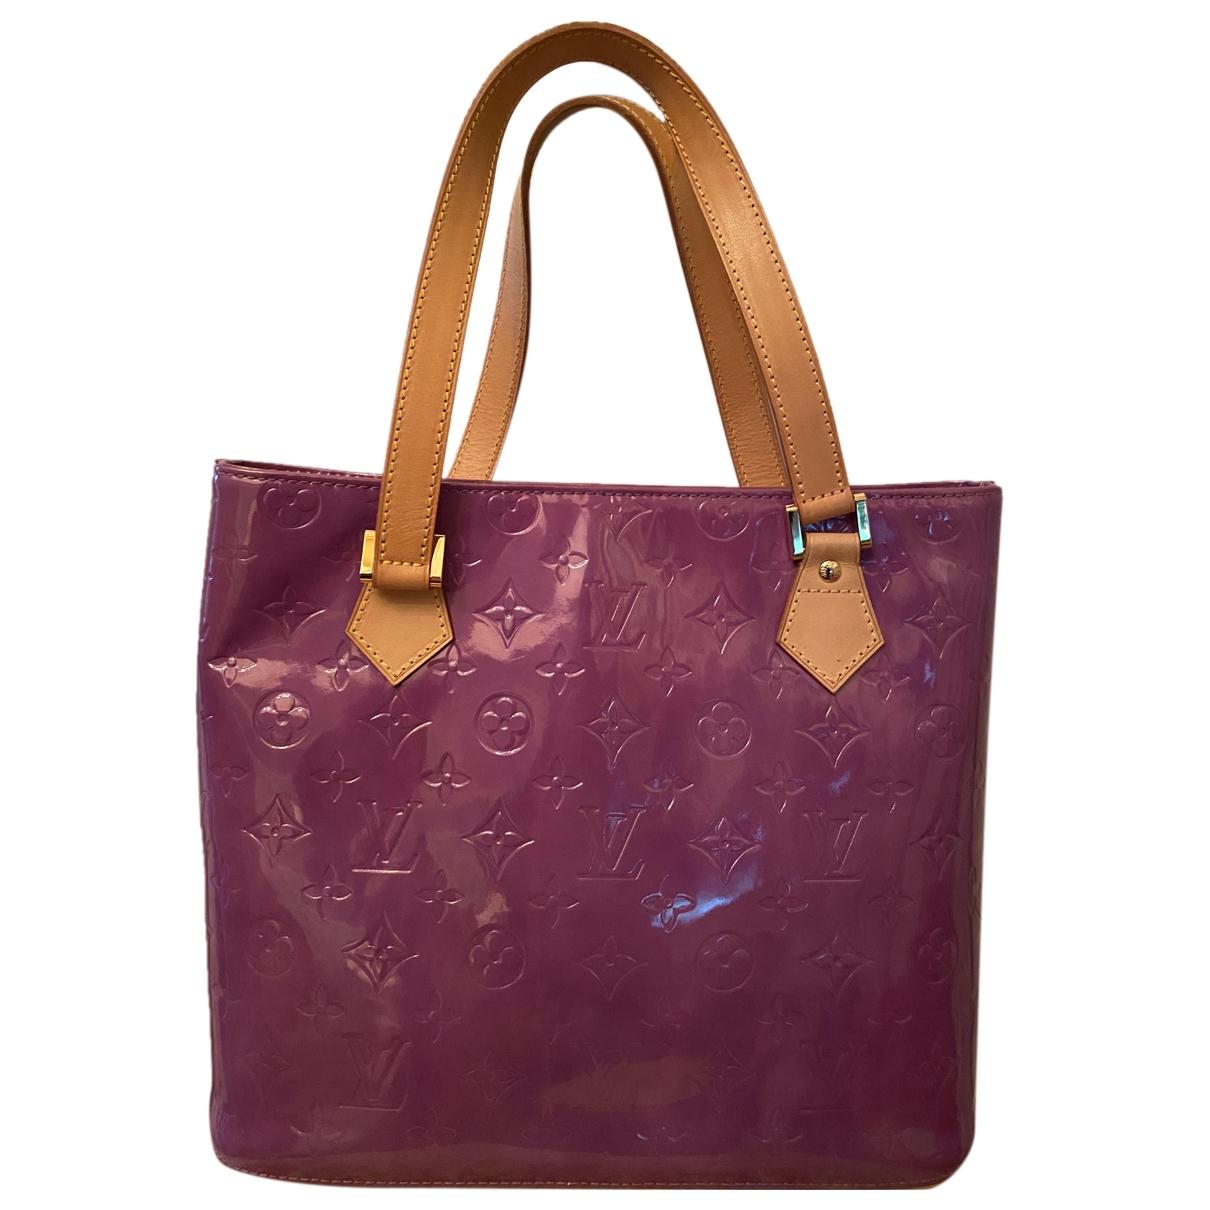 Louis Vuitton Houston Purple Patent leather handbag for Women \N